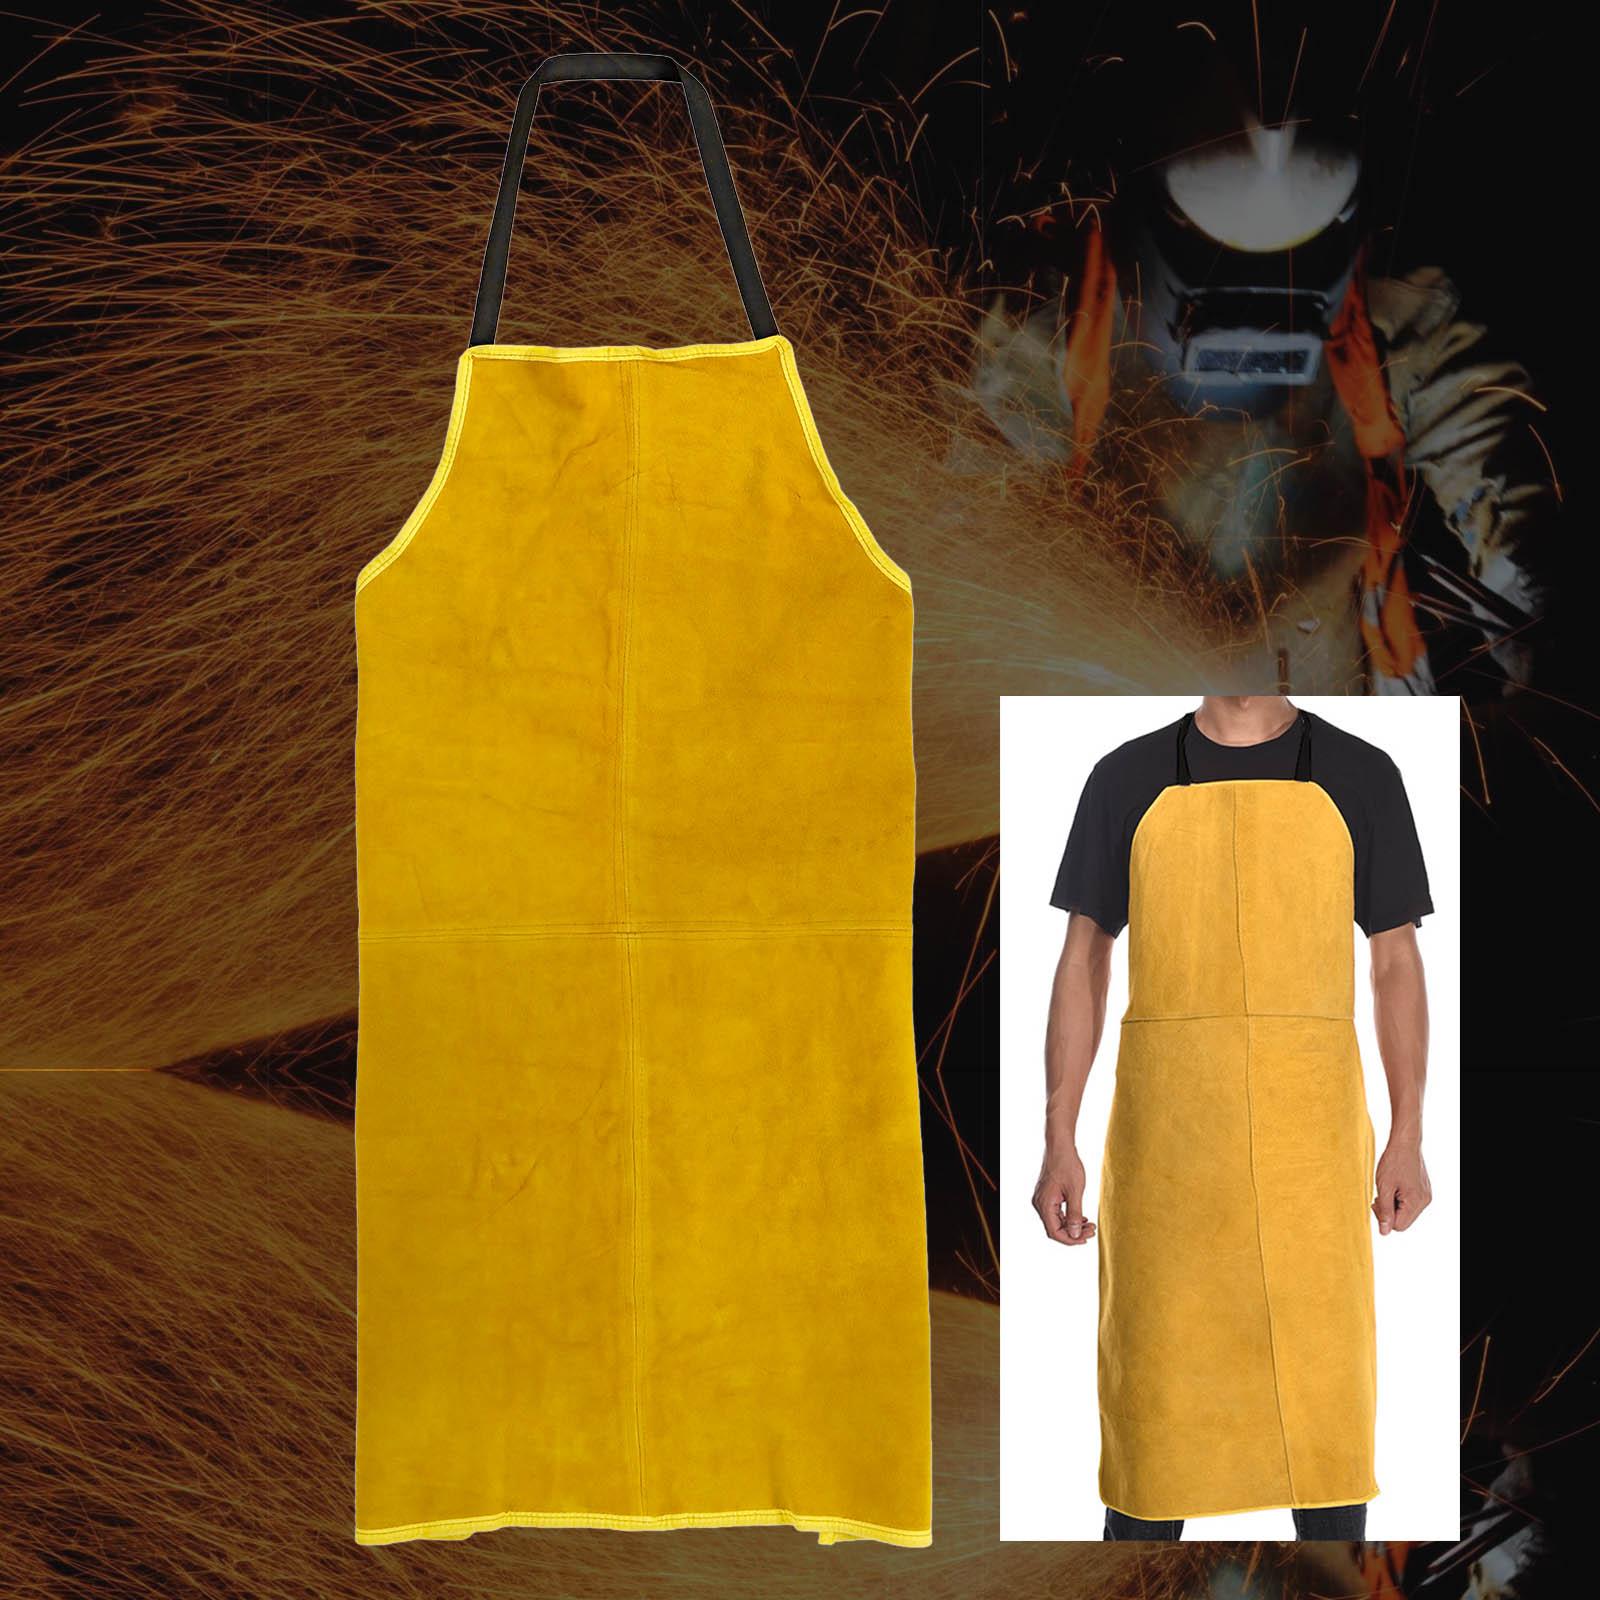 Full Cowhide Leather Electric Welding Apron Bib Blacksmith Apron Safety Clothing